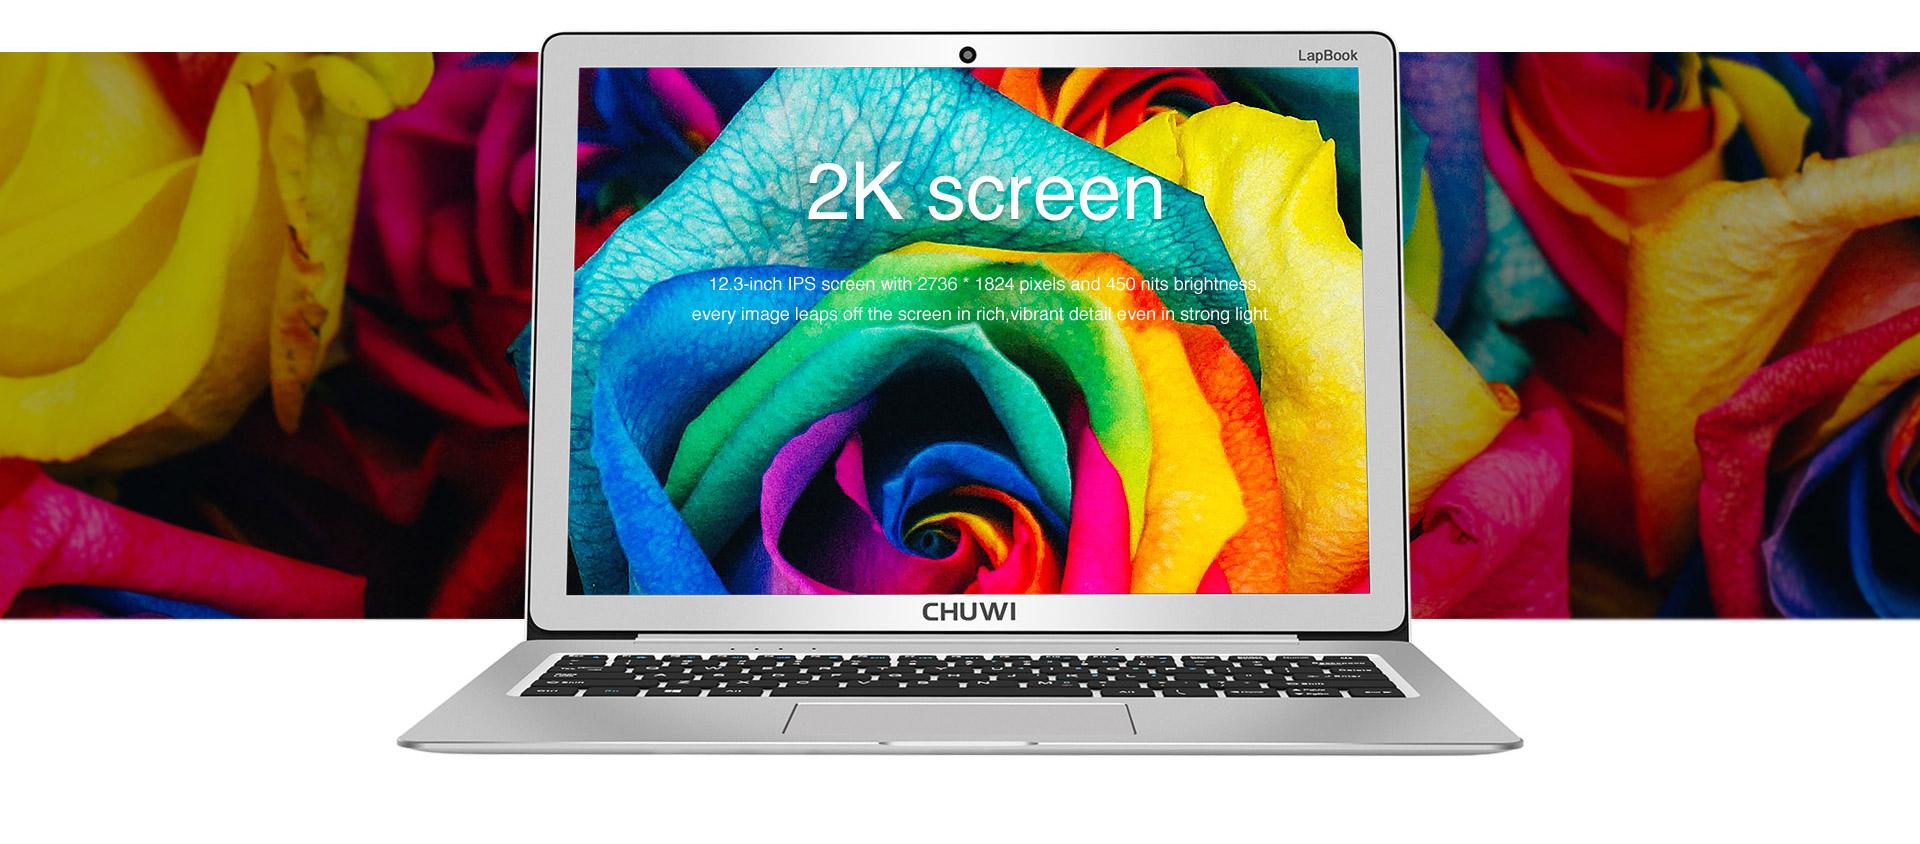 Chuwi 12.3 Lapbook um 251 € statt 360,40 € @gearbest